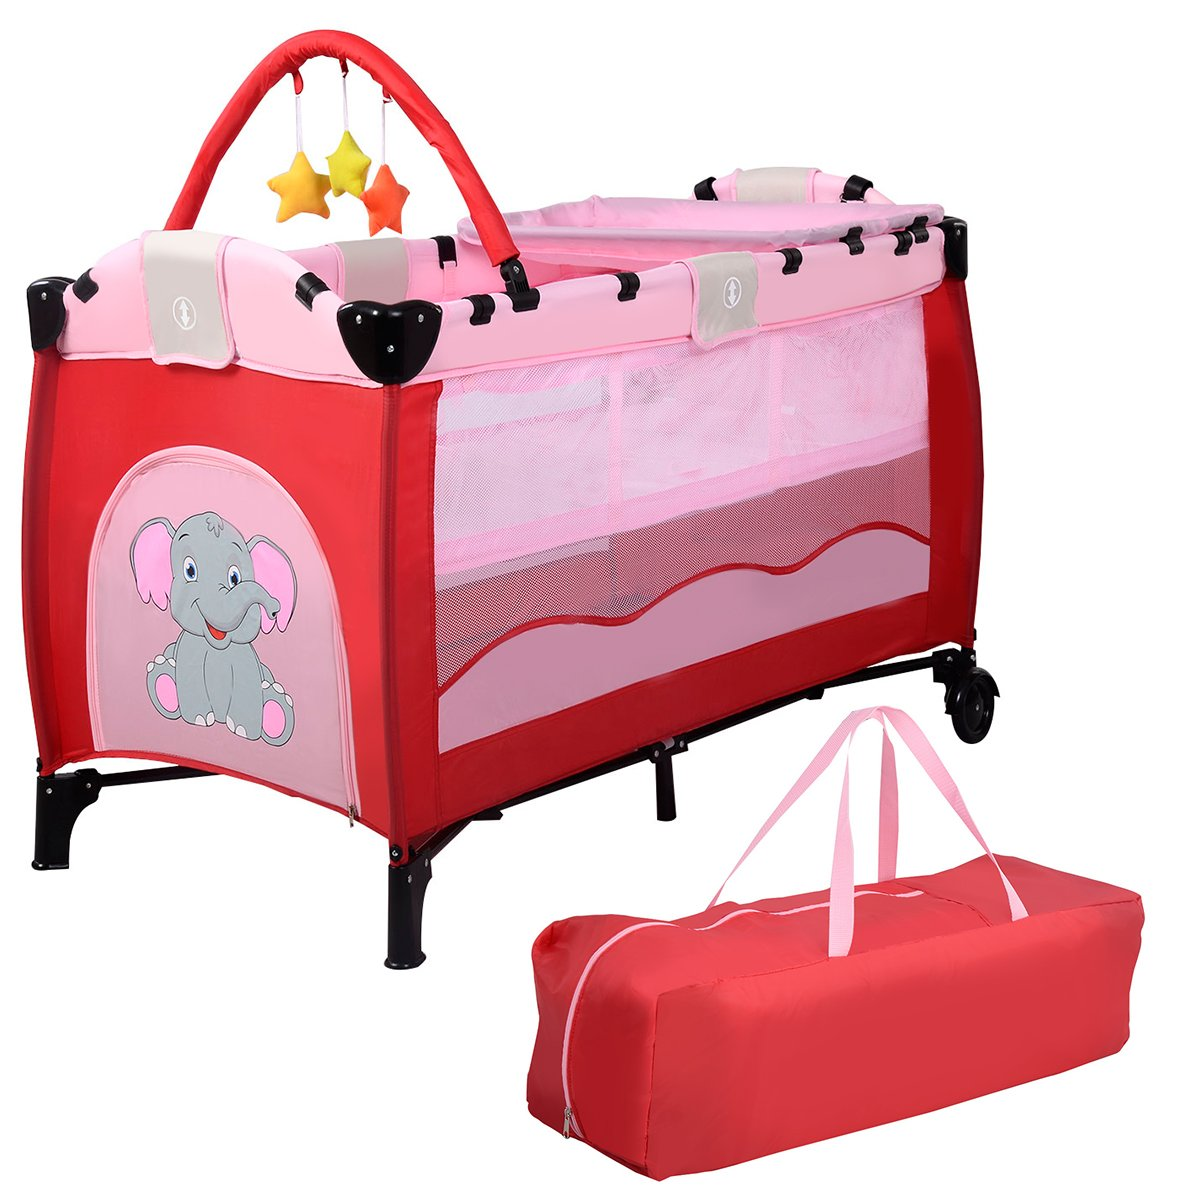 Giantex Pink Baby Crib Playpen Playard Pack Travel Infant Bassinet Bed Foldable